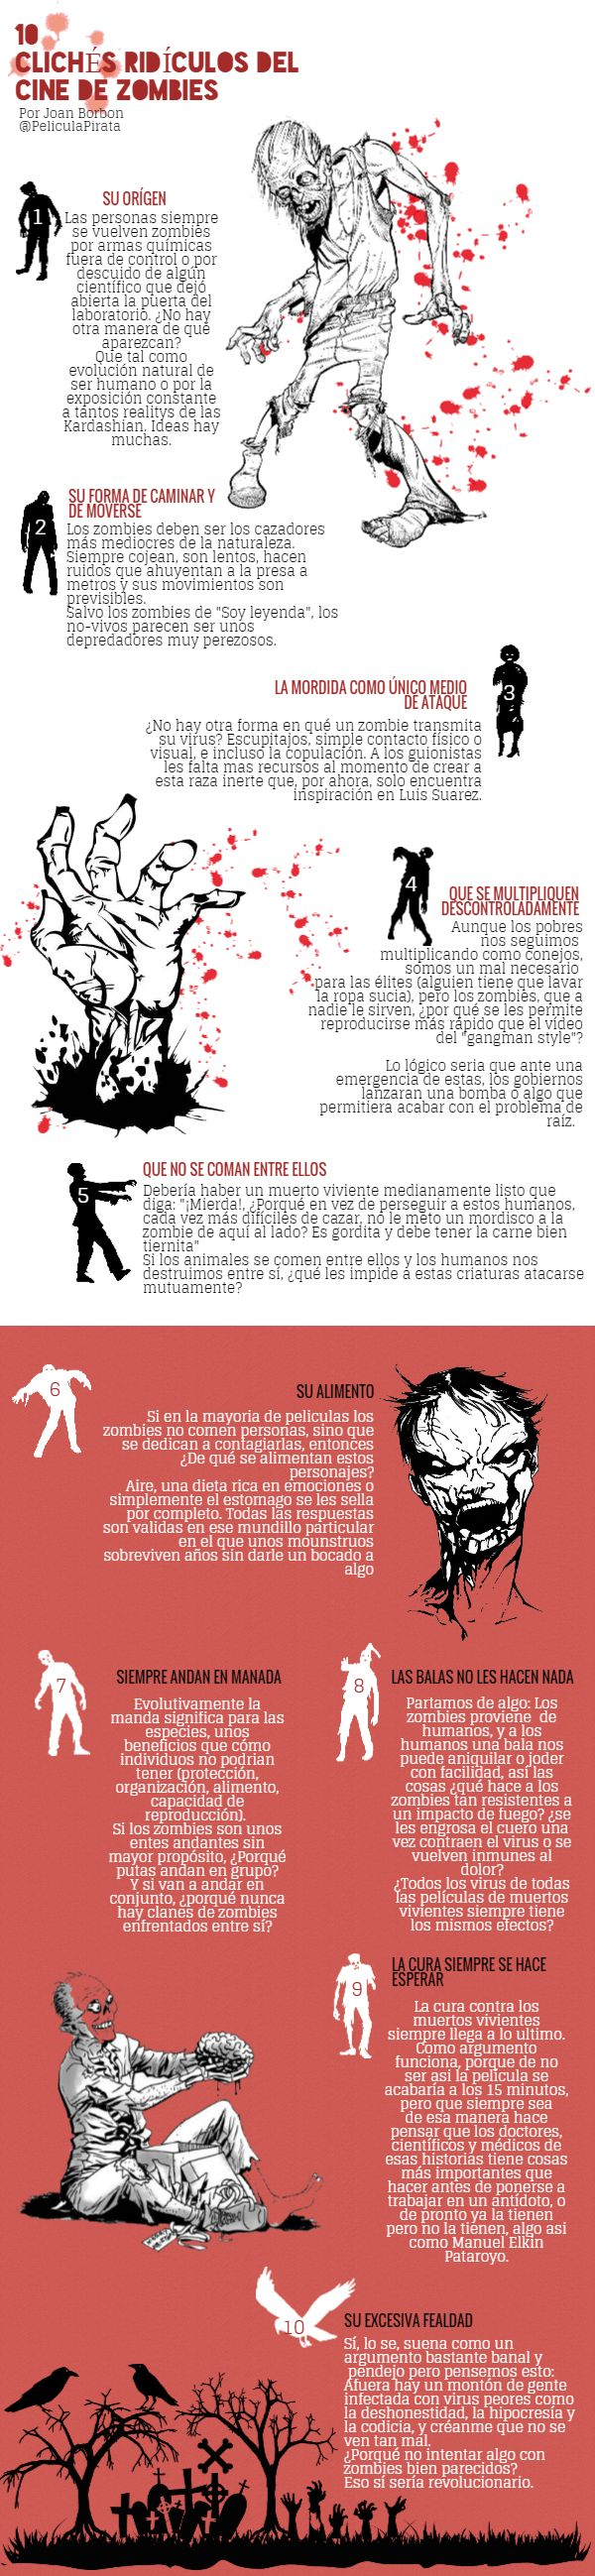 infografía sobre cine de zombies